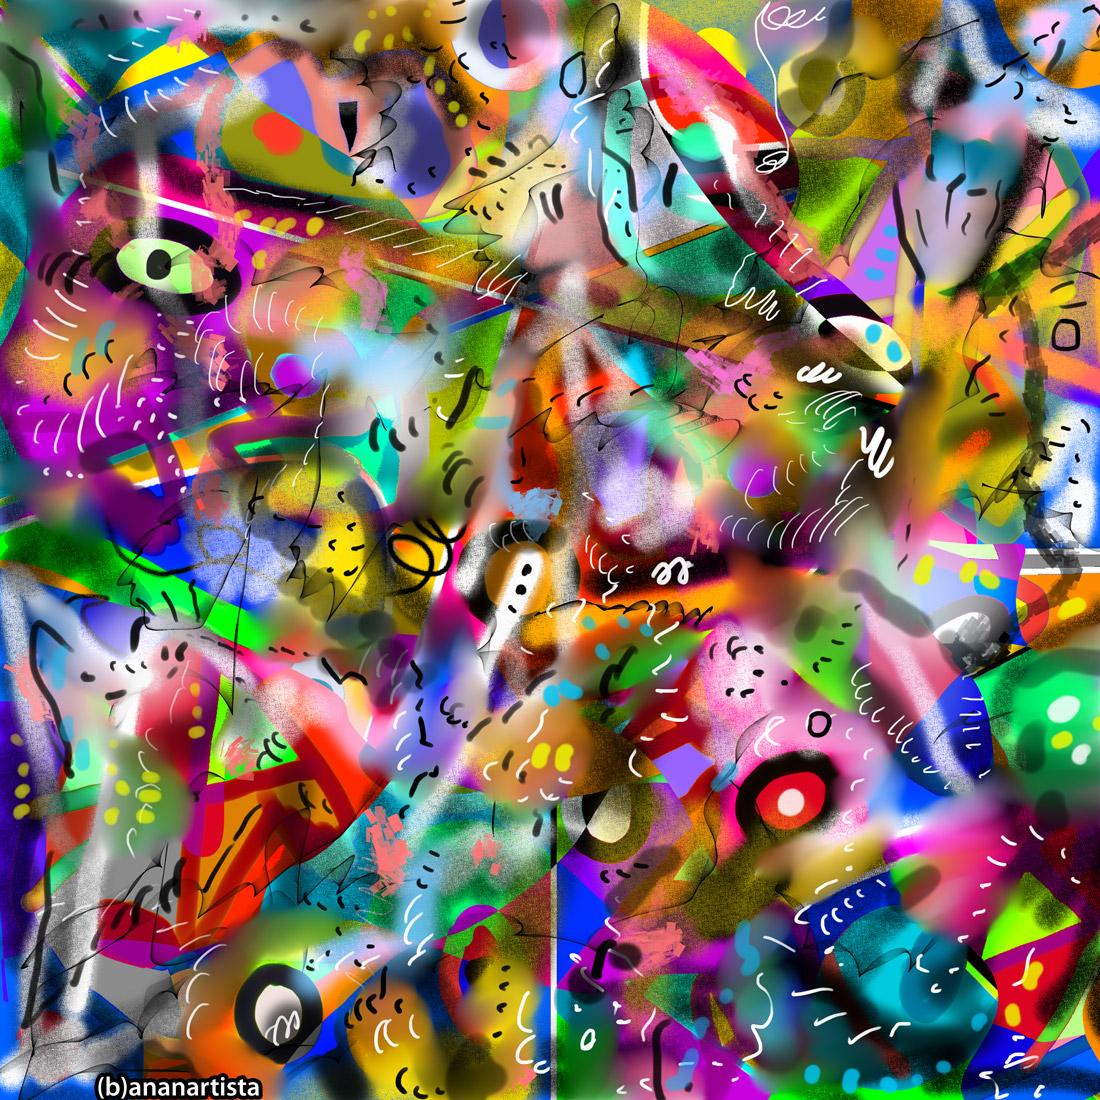 ASINTOTO: abstract digital art by (b)ananartista sbuff